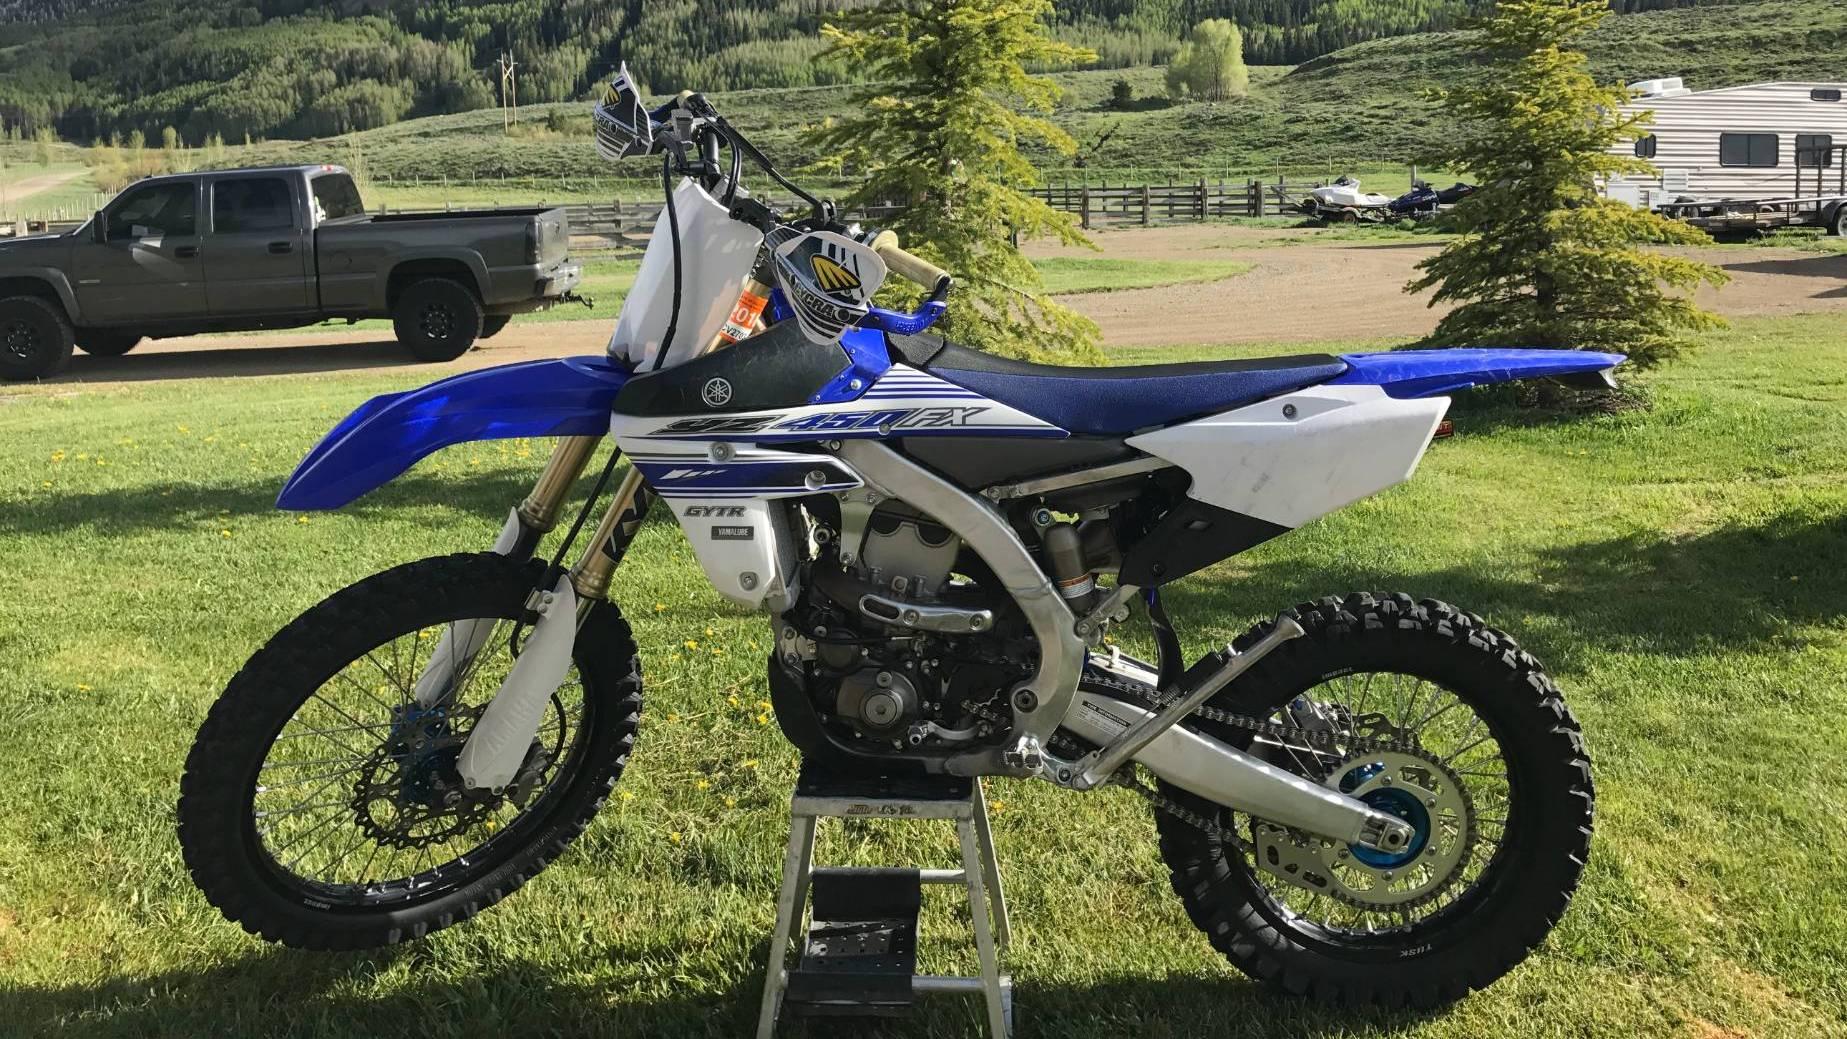 Yamaha Yz450fx For Rent Near Gunnison Co Riders Share